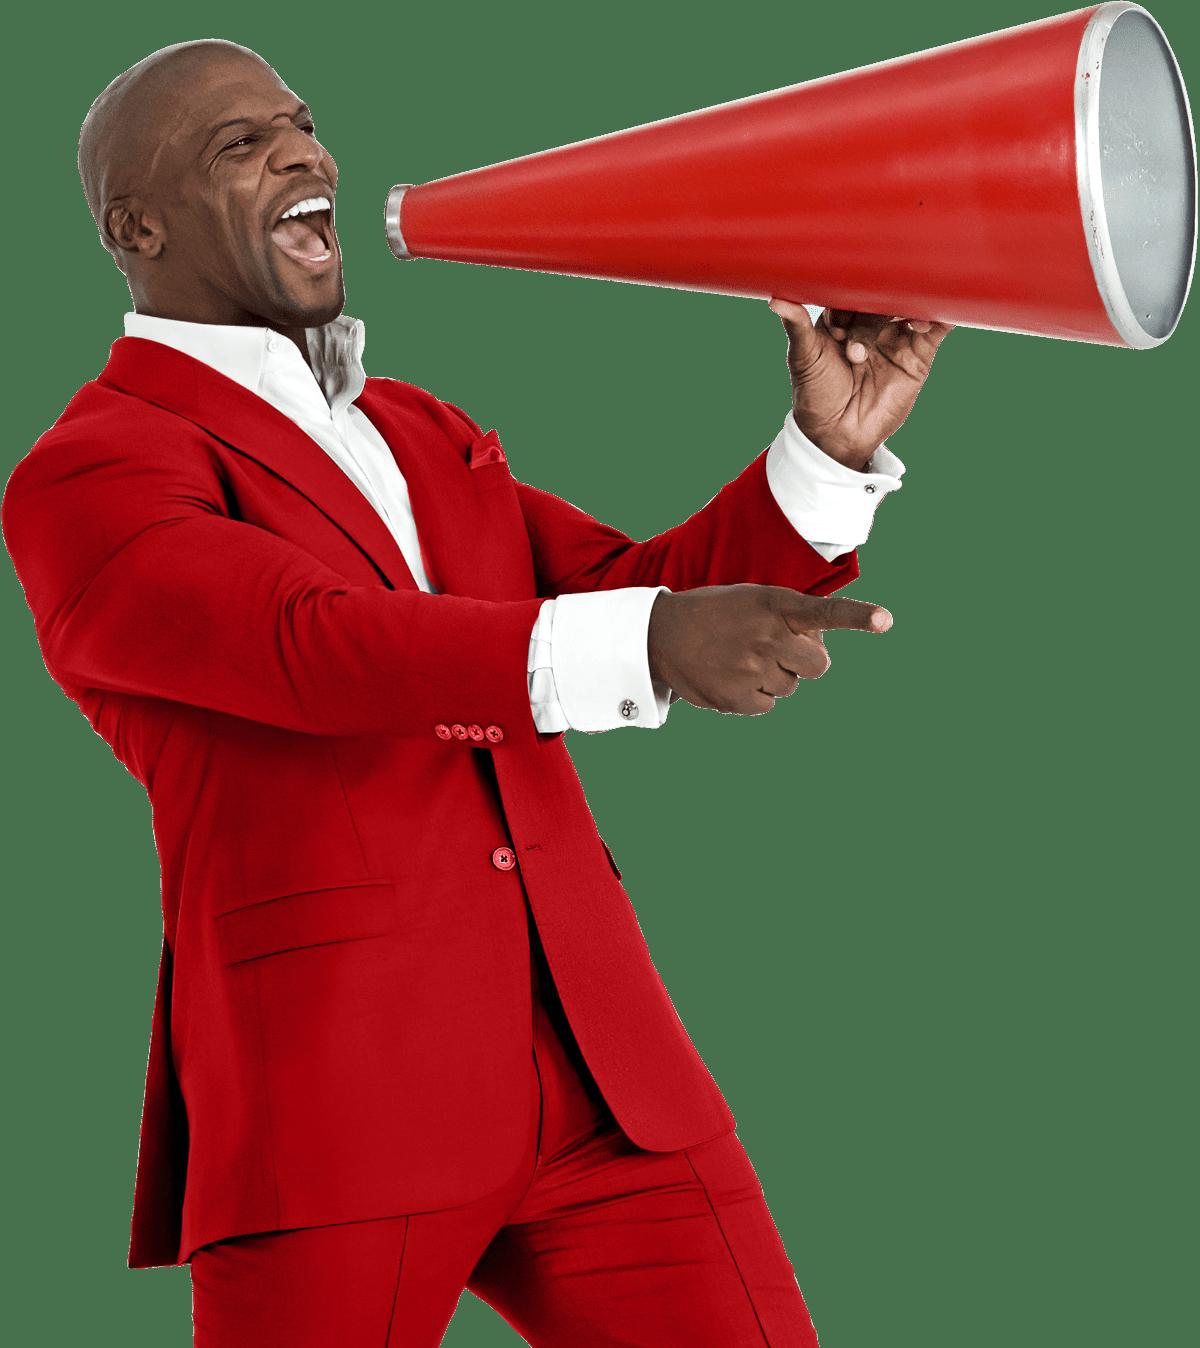 chief identity champion with megaphone